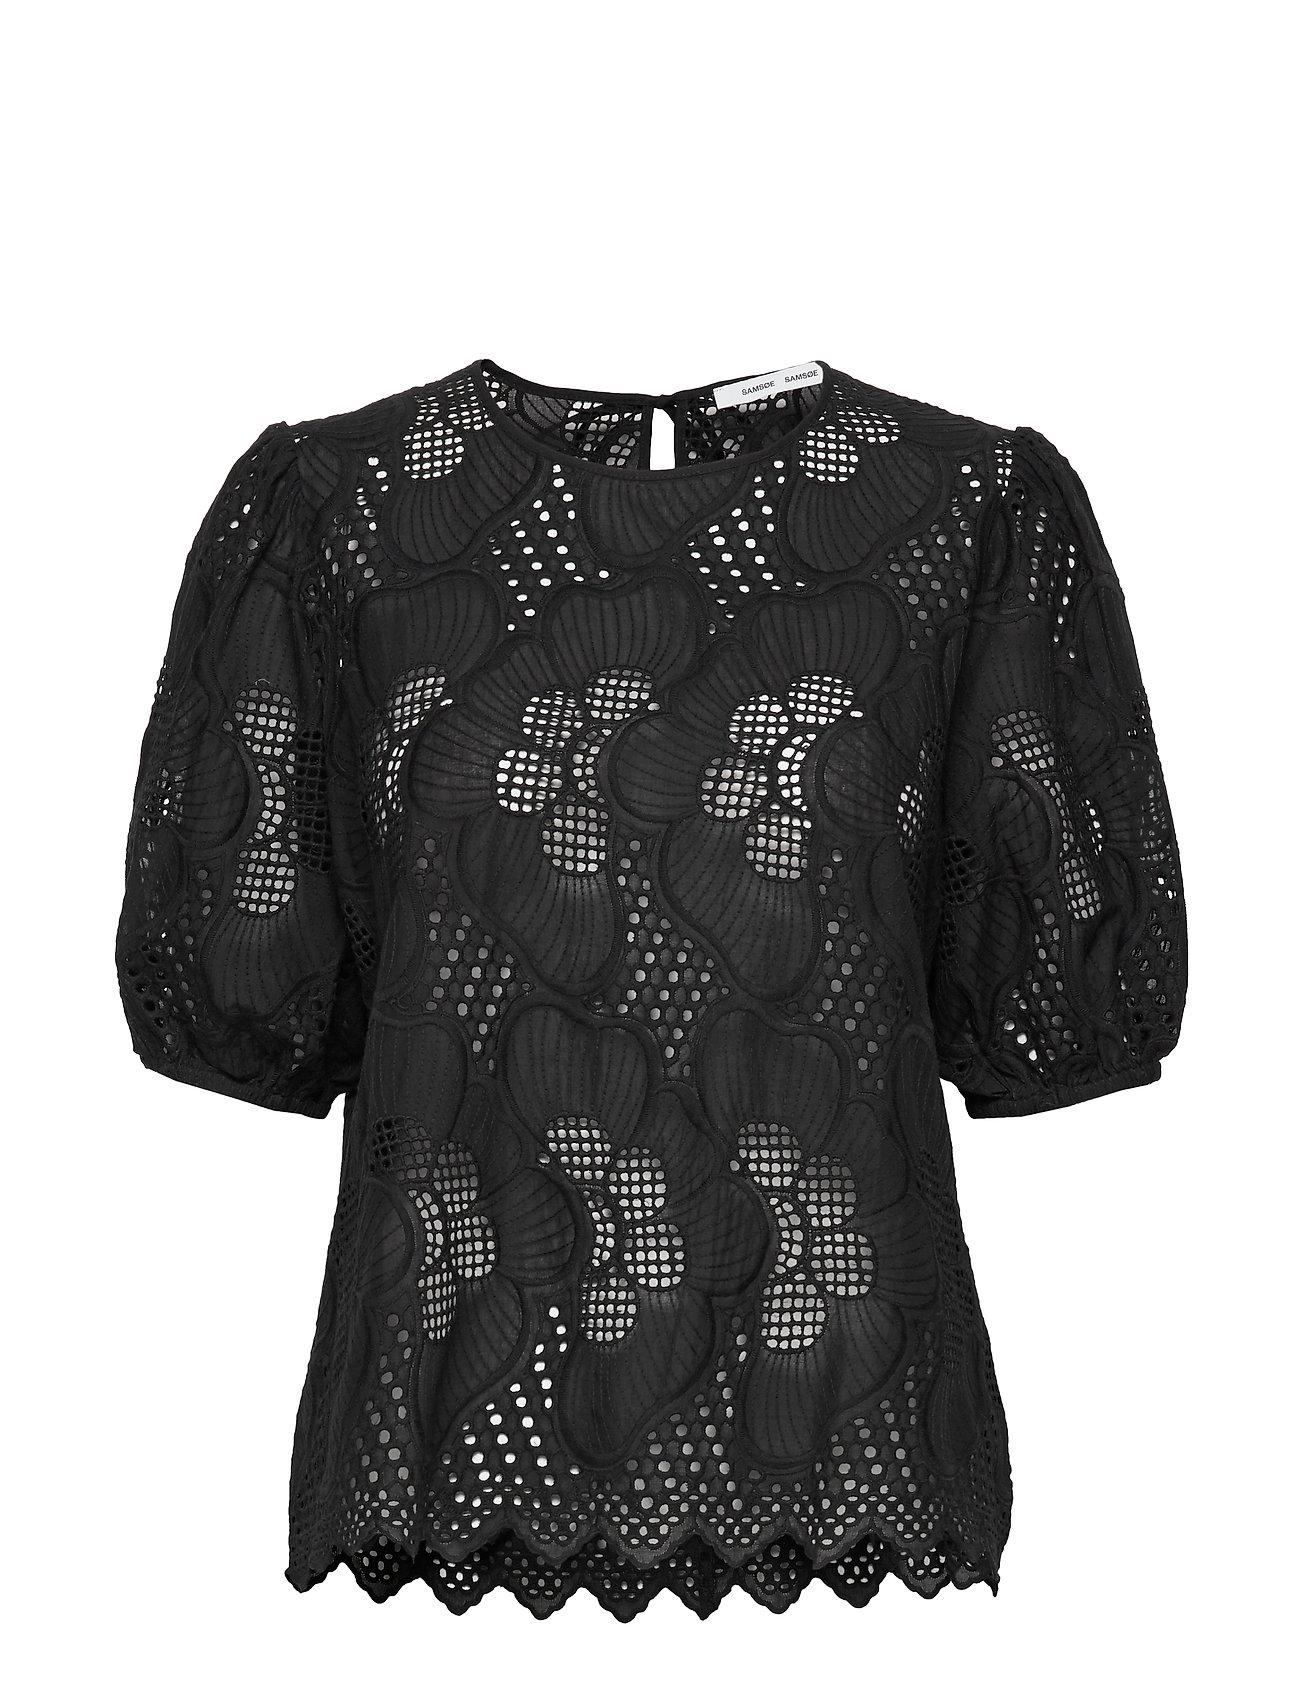 Samsøe Samsøe Juni ss blouse 11455 - BLACK